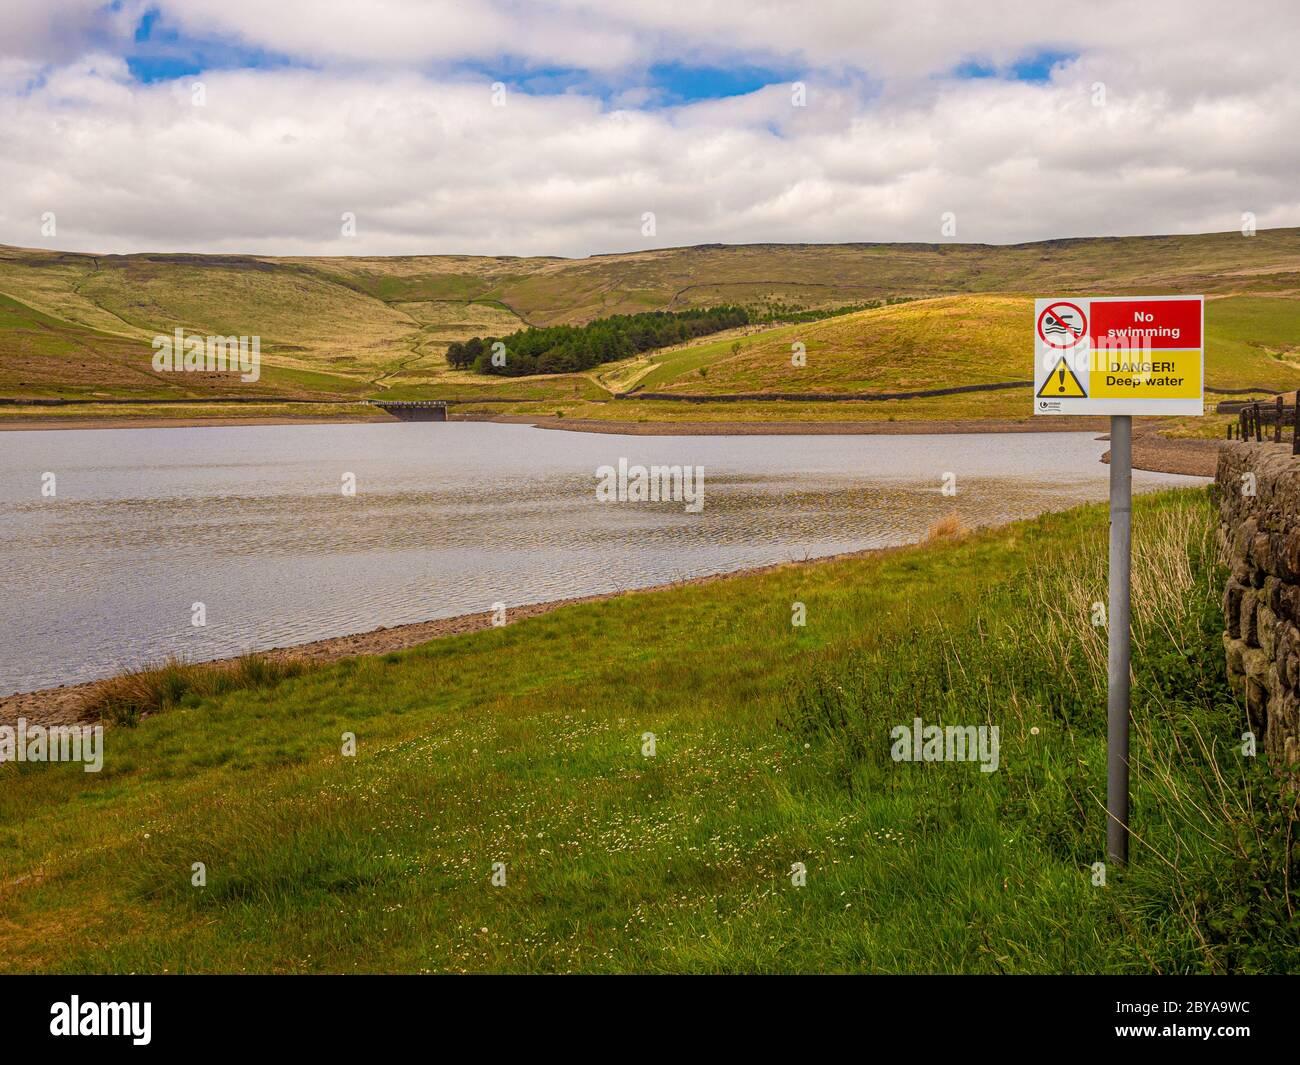 Castleshaw Upper Reservoir. No Swimming, Danger Deep Water sign. Lancashire UK. Stock Photo